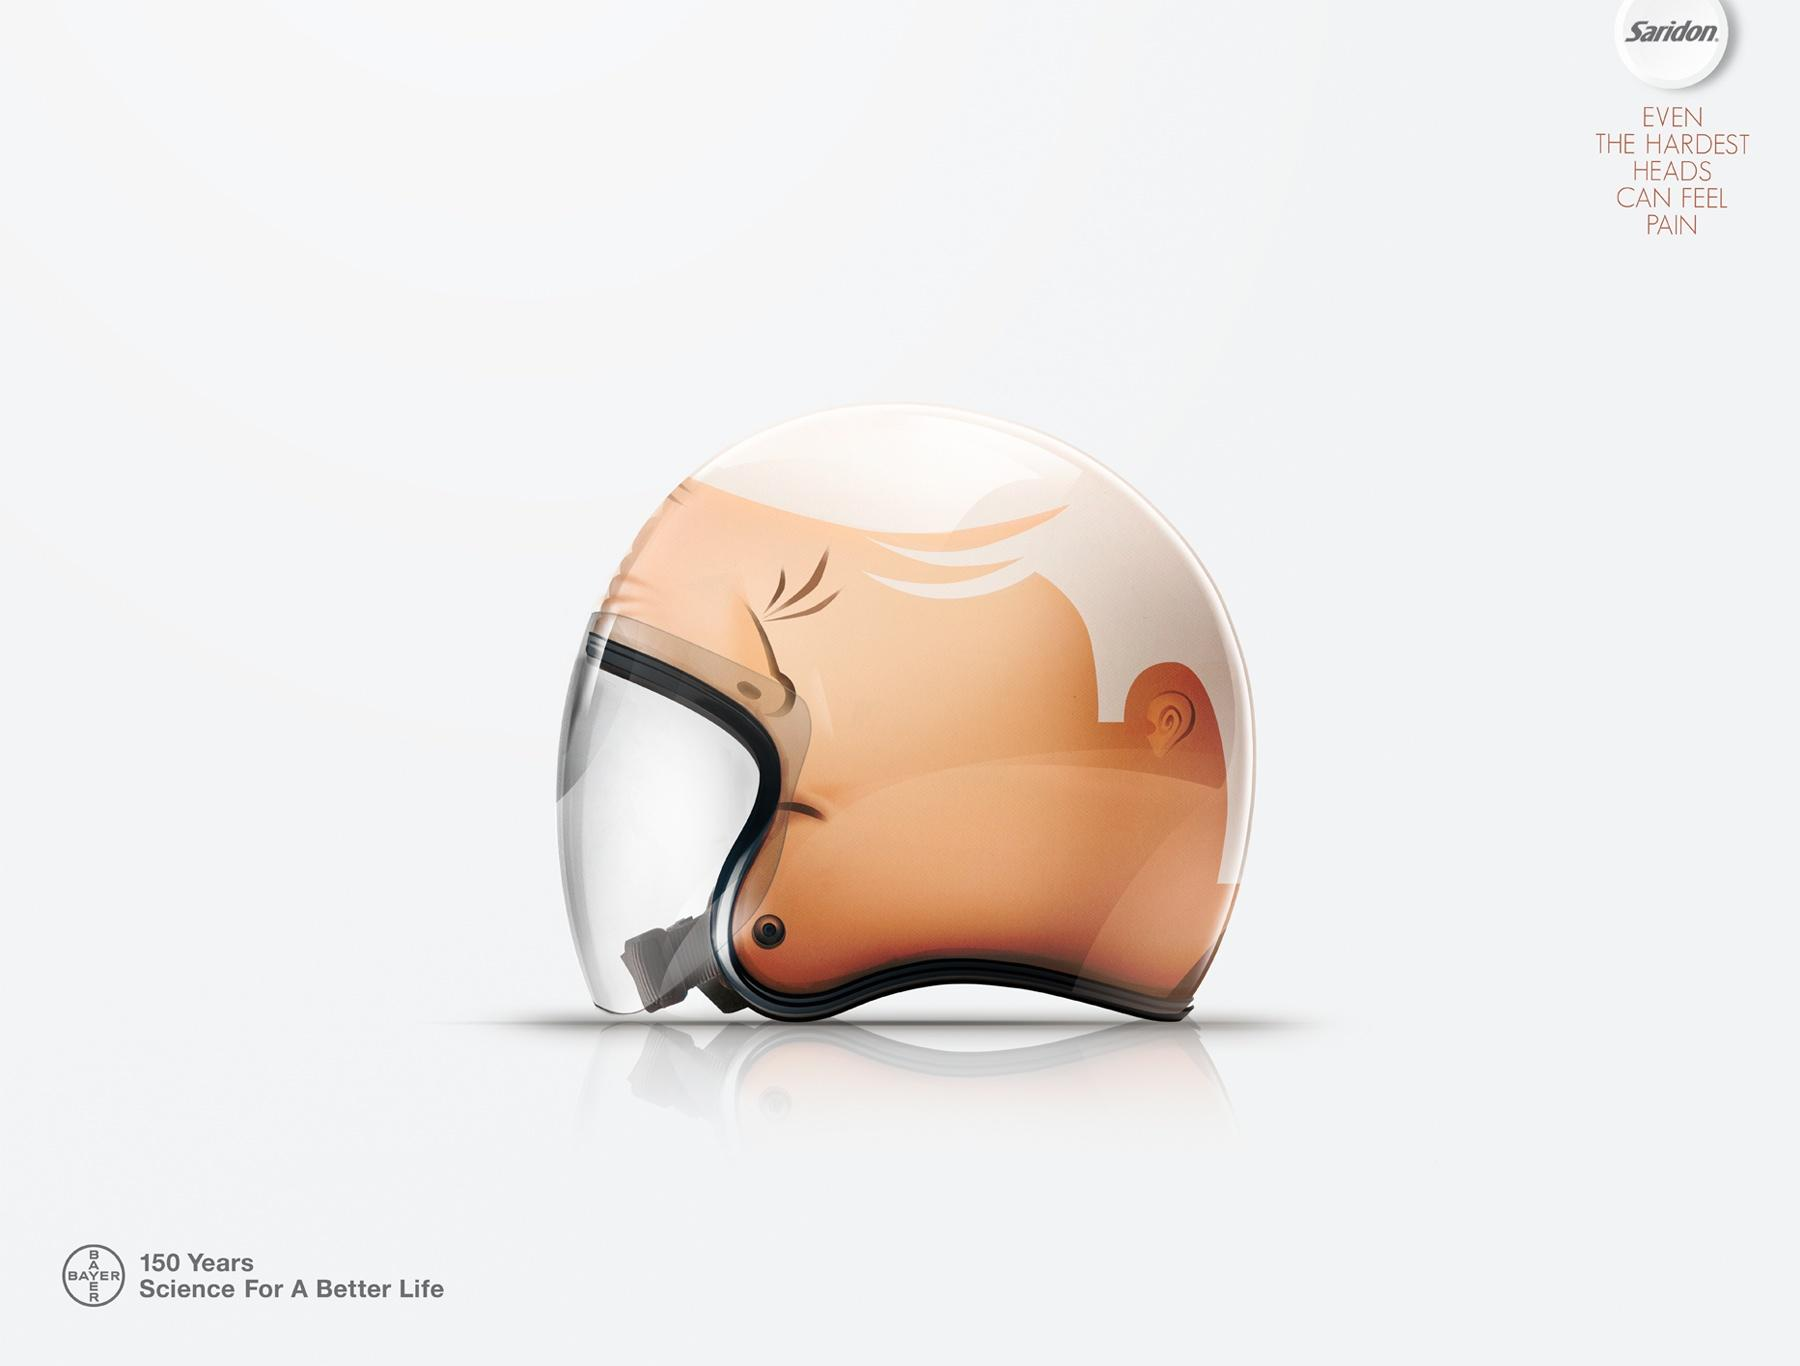 Saridon Print Ad -  Motorcycle helmet